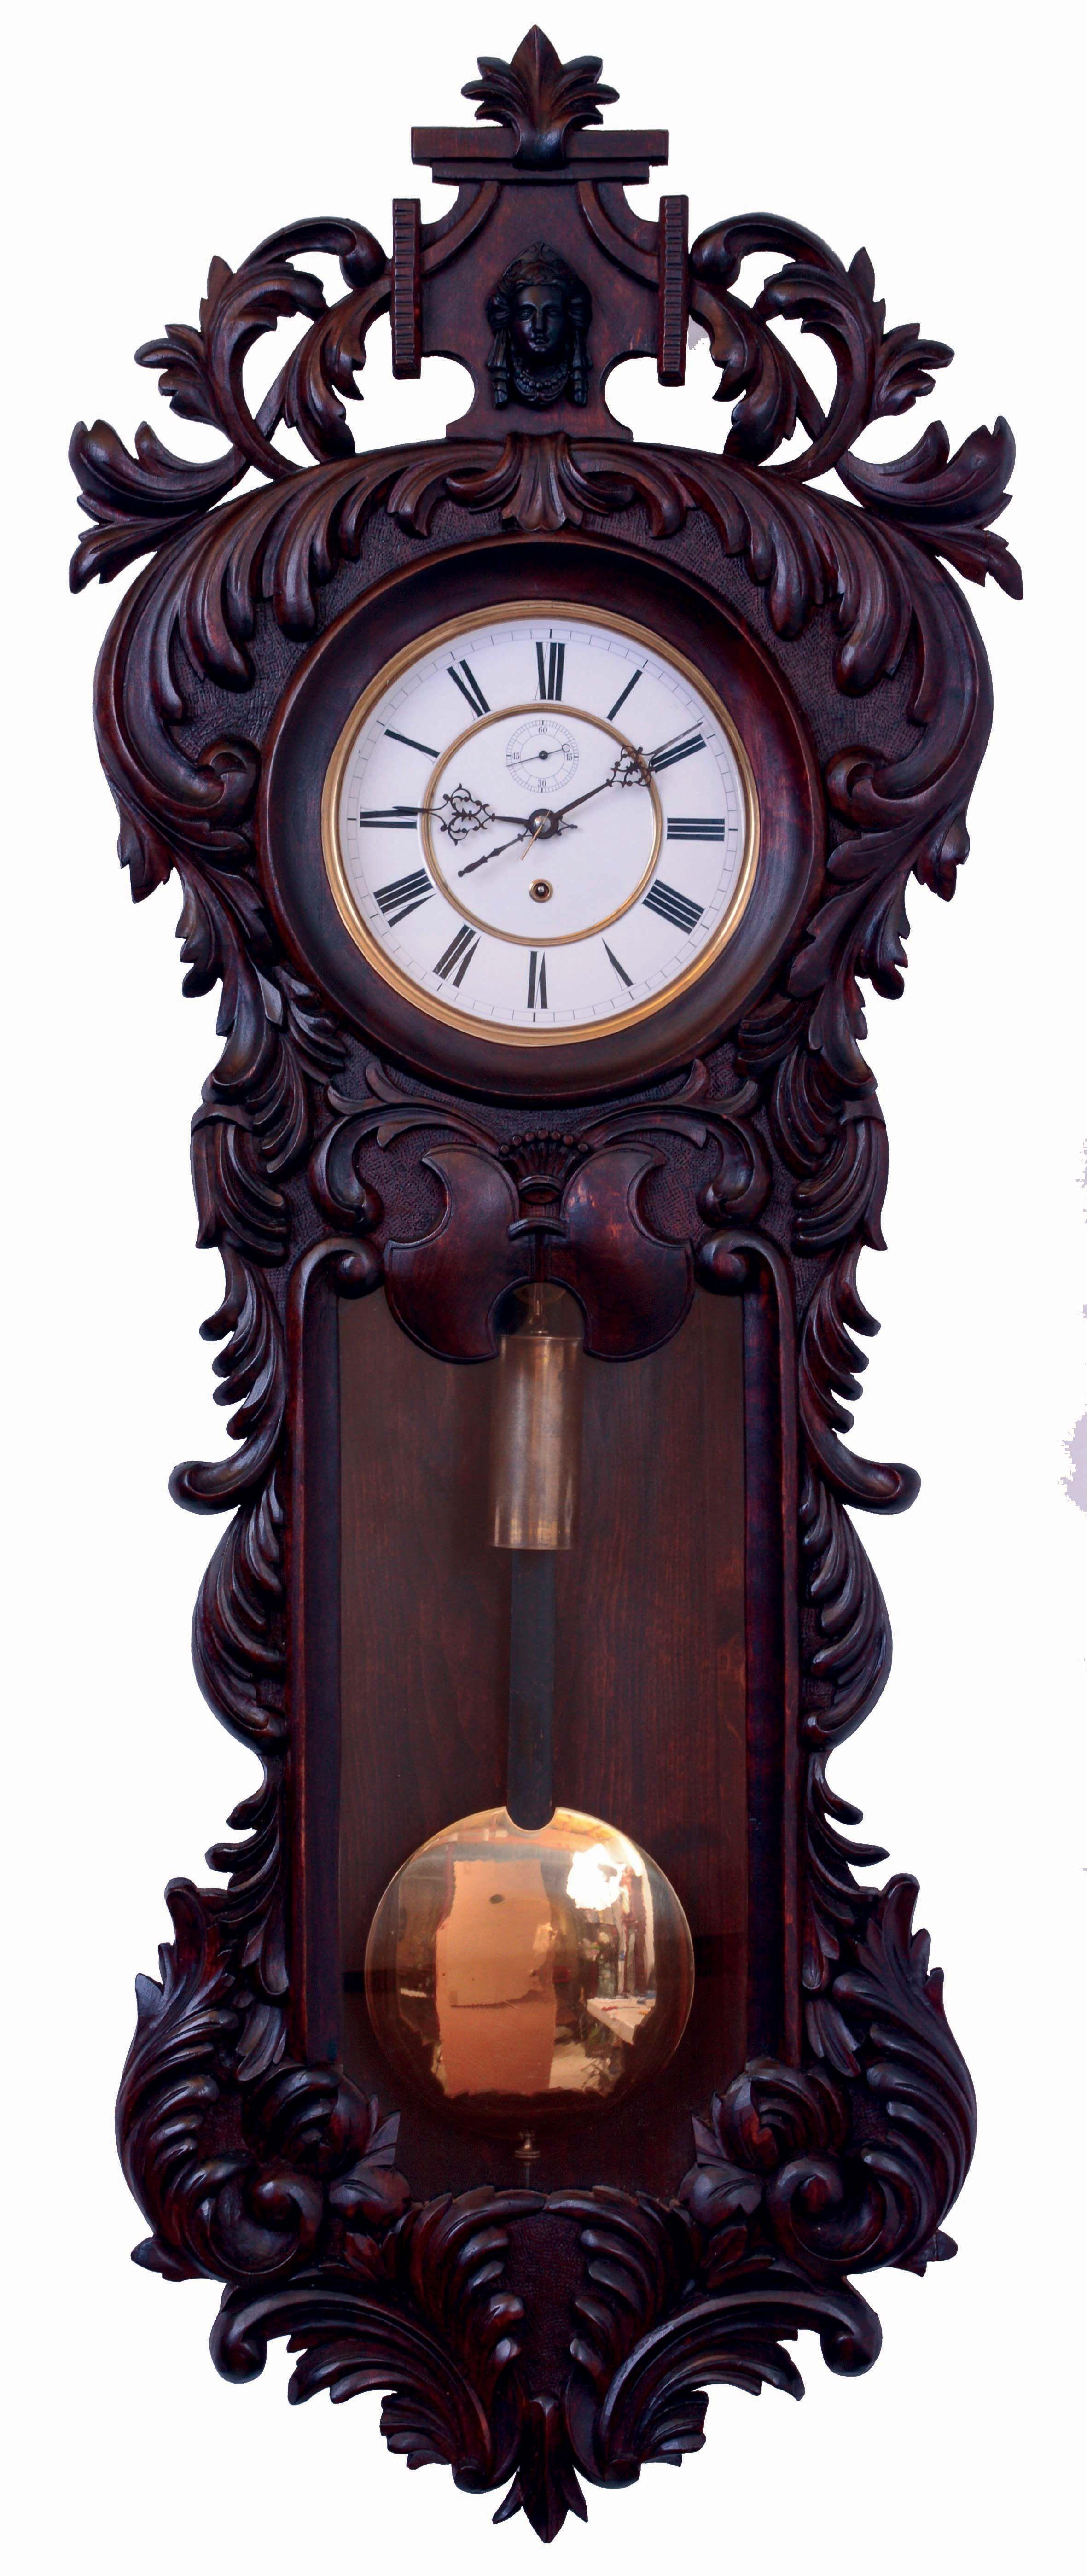 Pin by lenzkirchfan on lenzkirch clocks pinterest clocks clock wall hanging clock pendulum clock grandfather clocks antique clocks tick tock clock french country bedrooms tik took wooden clock amipublicfo Image collections